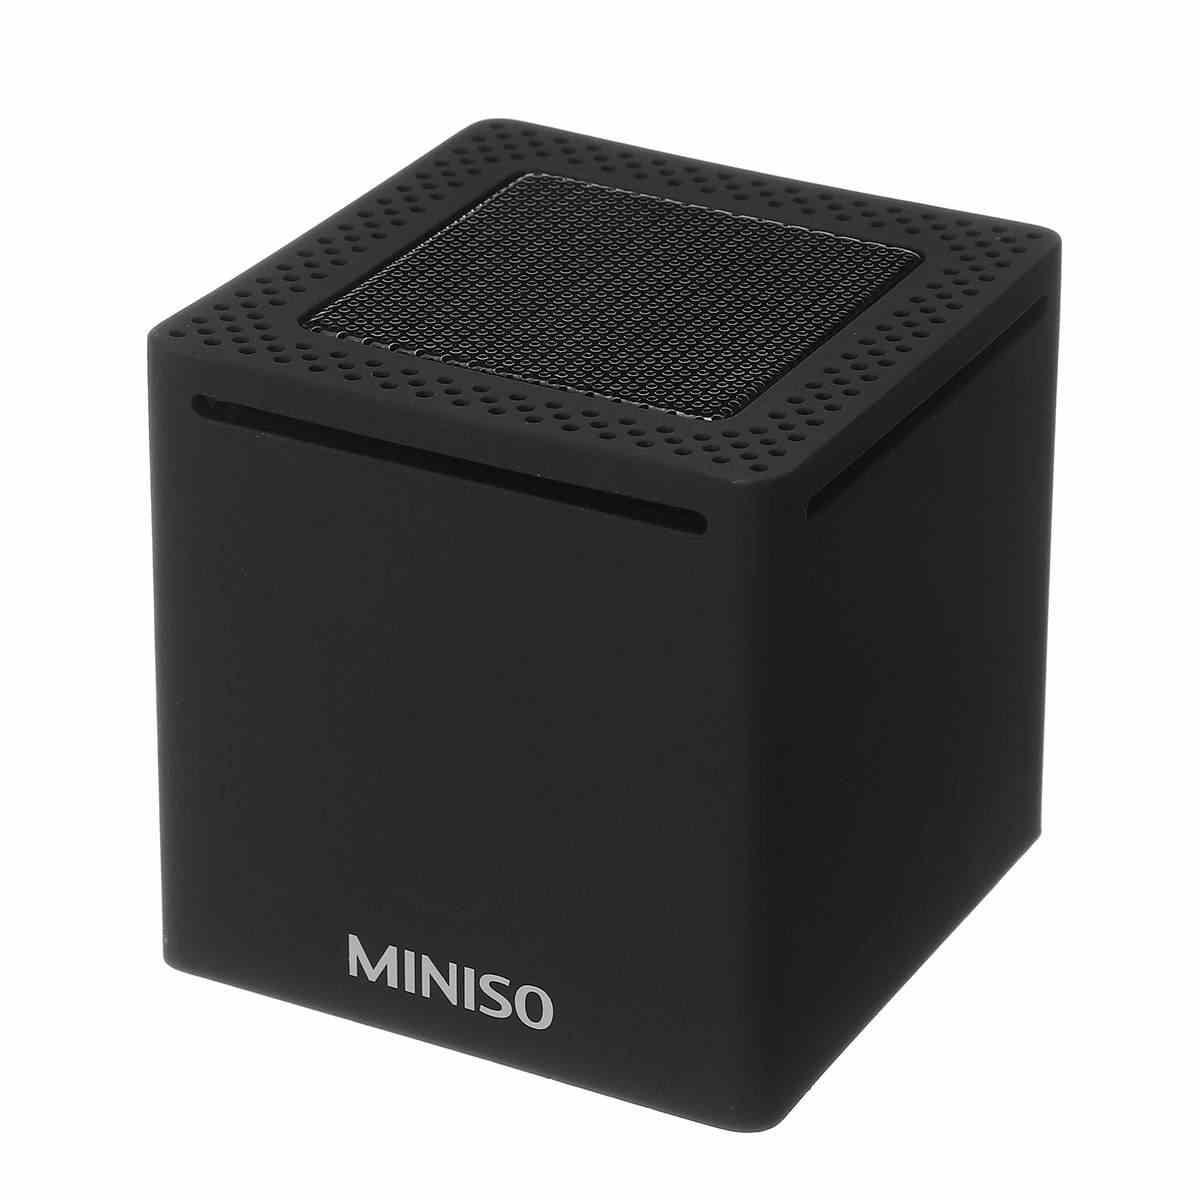 Globle Versi Miniso Bluetooth Speaker Mini Portable Nirkabel Pengeras Suara Speaker untuk Ponsel Komputer Stereo Musik Outdoor